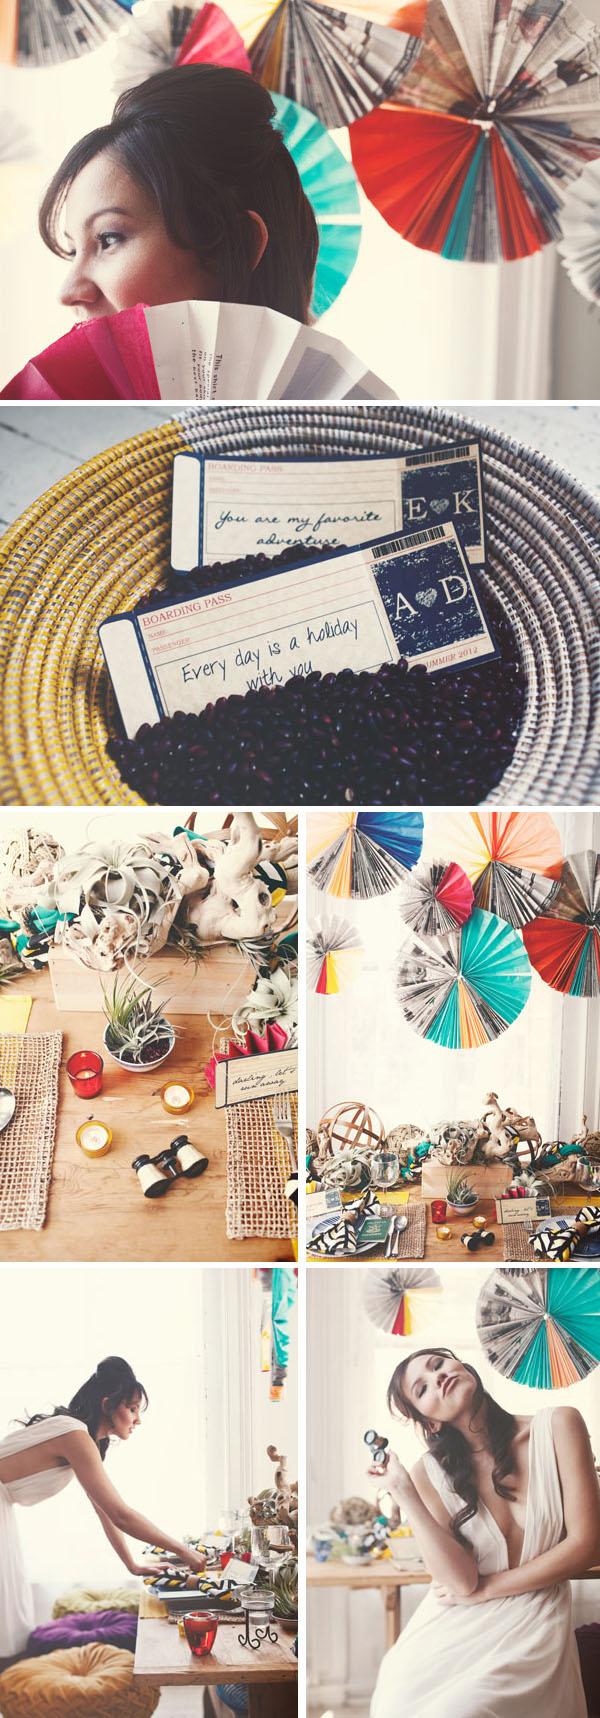 Honeymoon staycation ideas 3